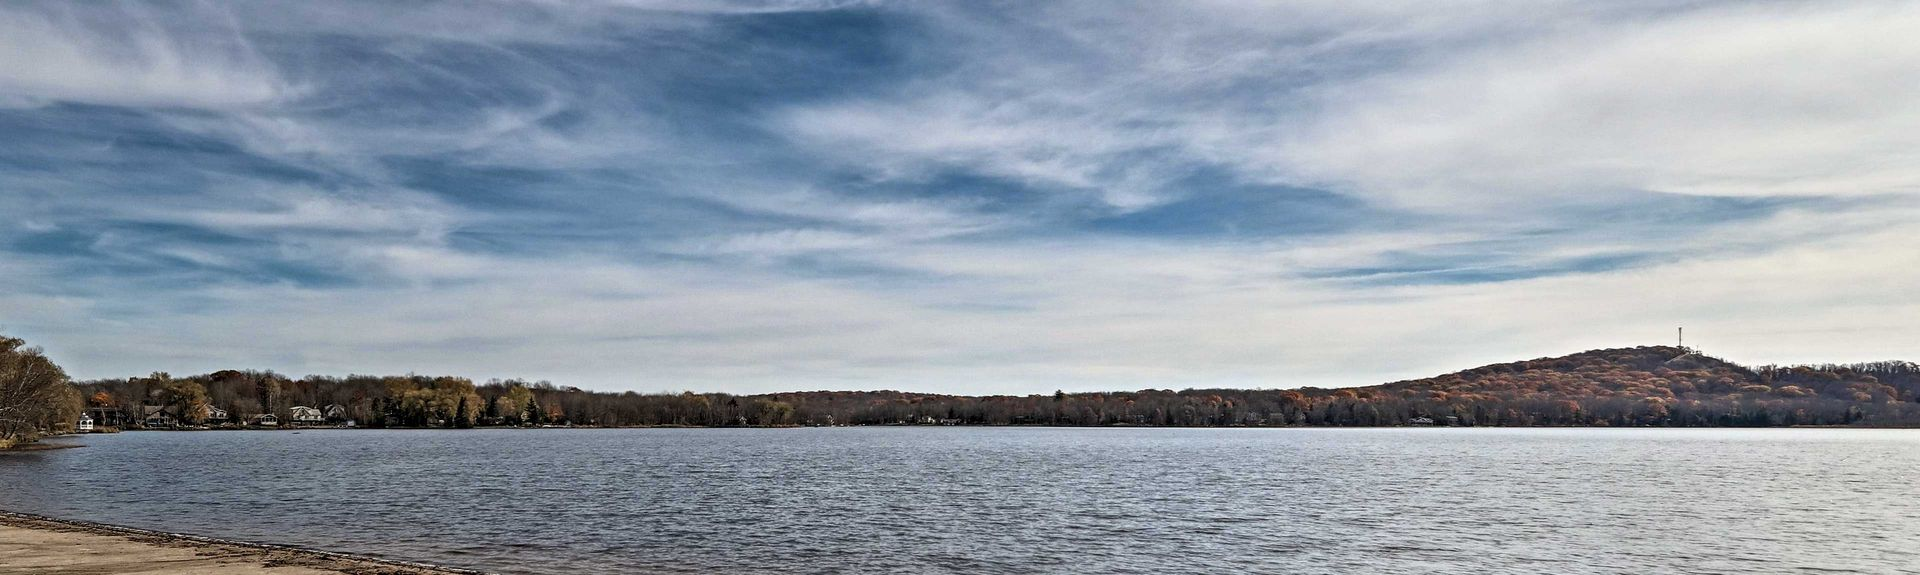 Arrowhead Lake, PA, USA